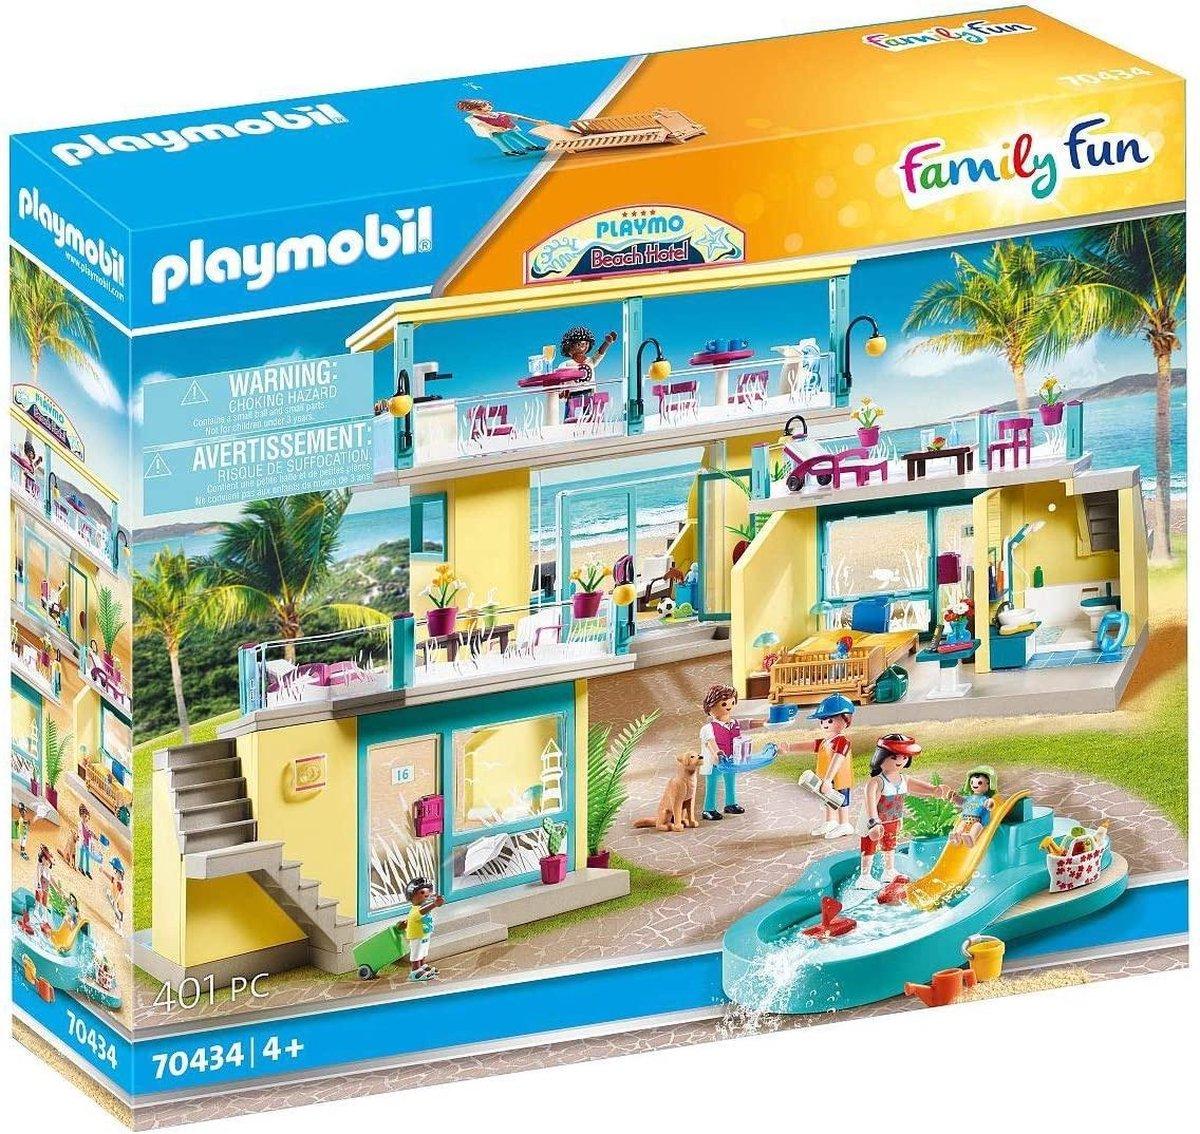 PLAYMOBIL Family Fun PLAYMO Strandhotel - 70434